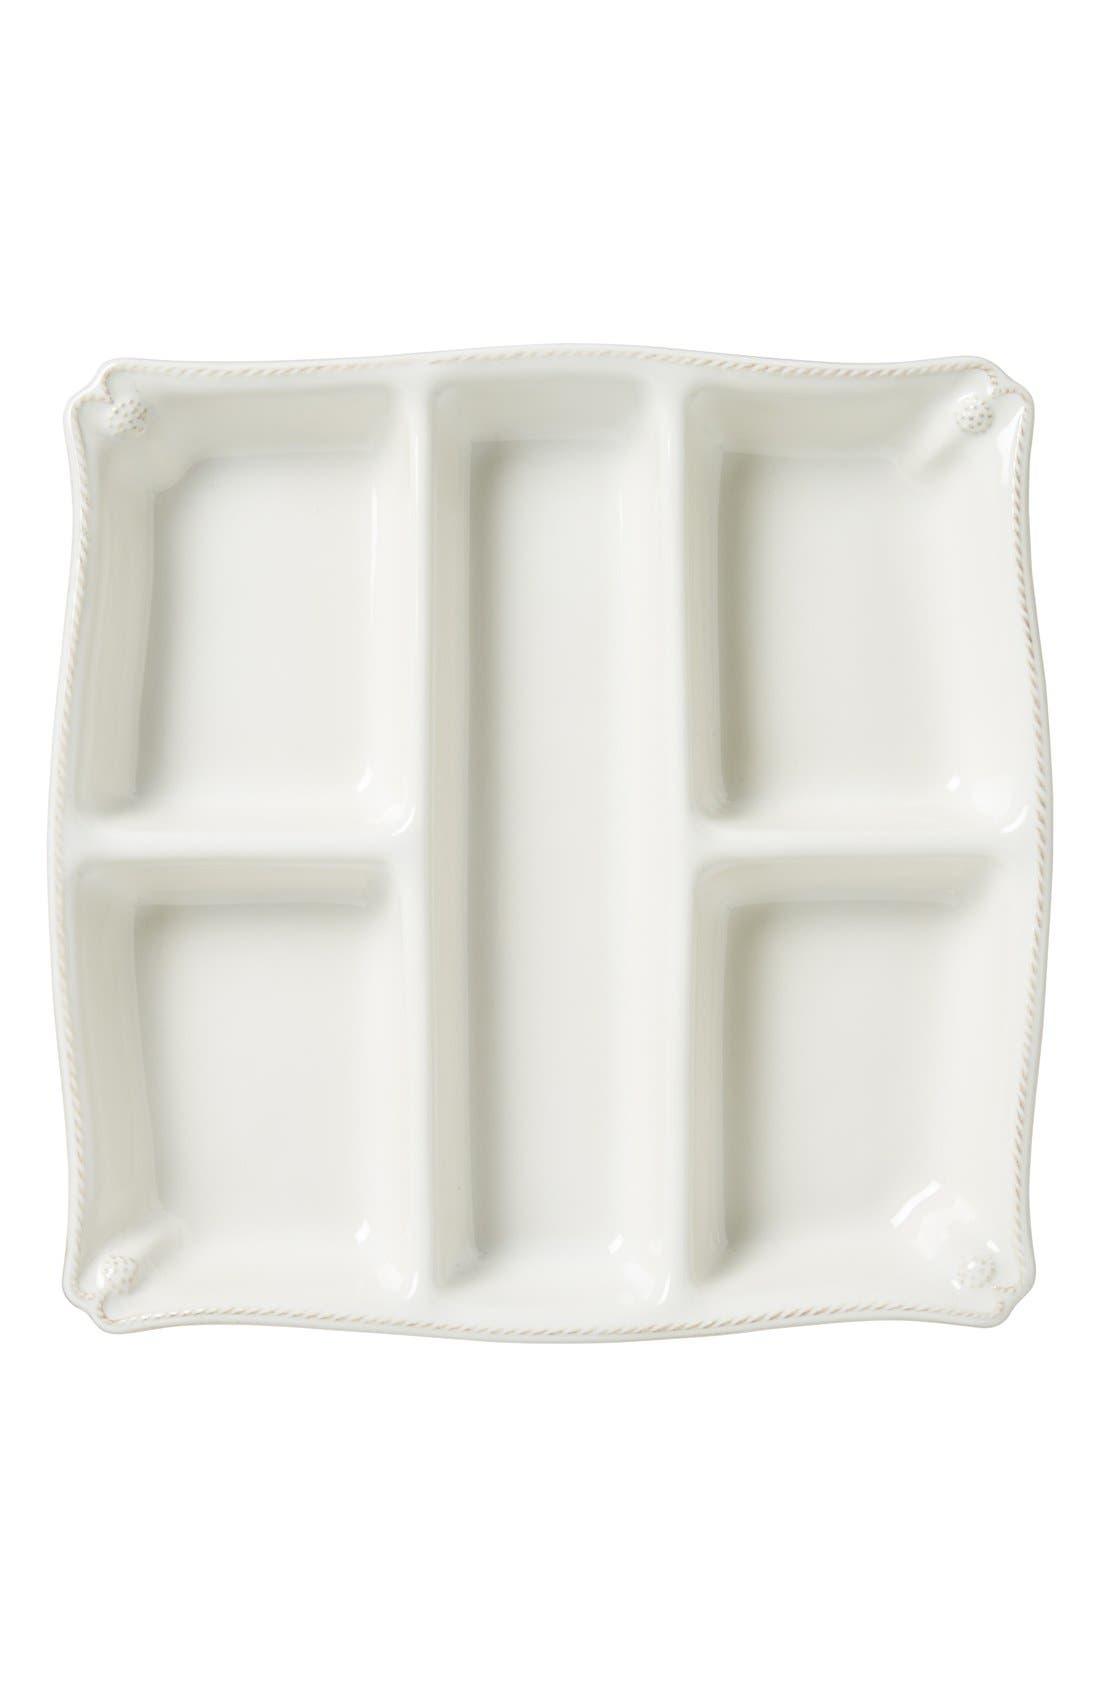 Alternate Image 1 Selected - Juliska'Berry and Thread' Ceramic Appetizer Platter